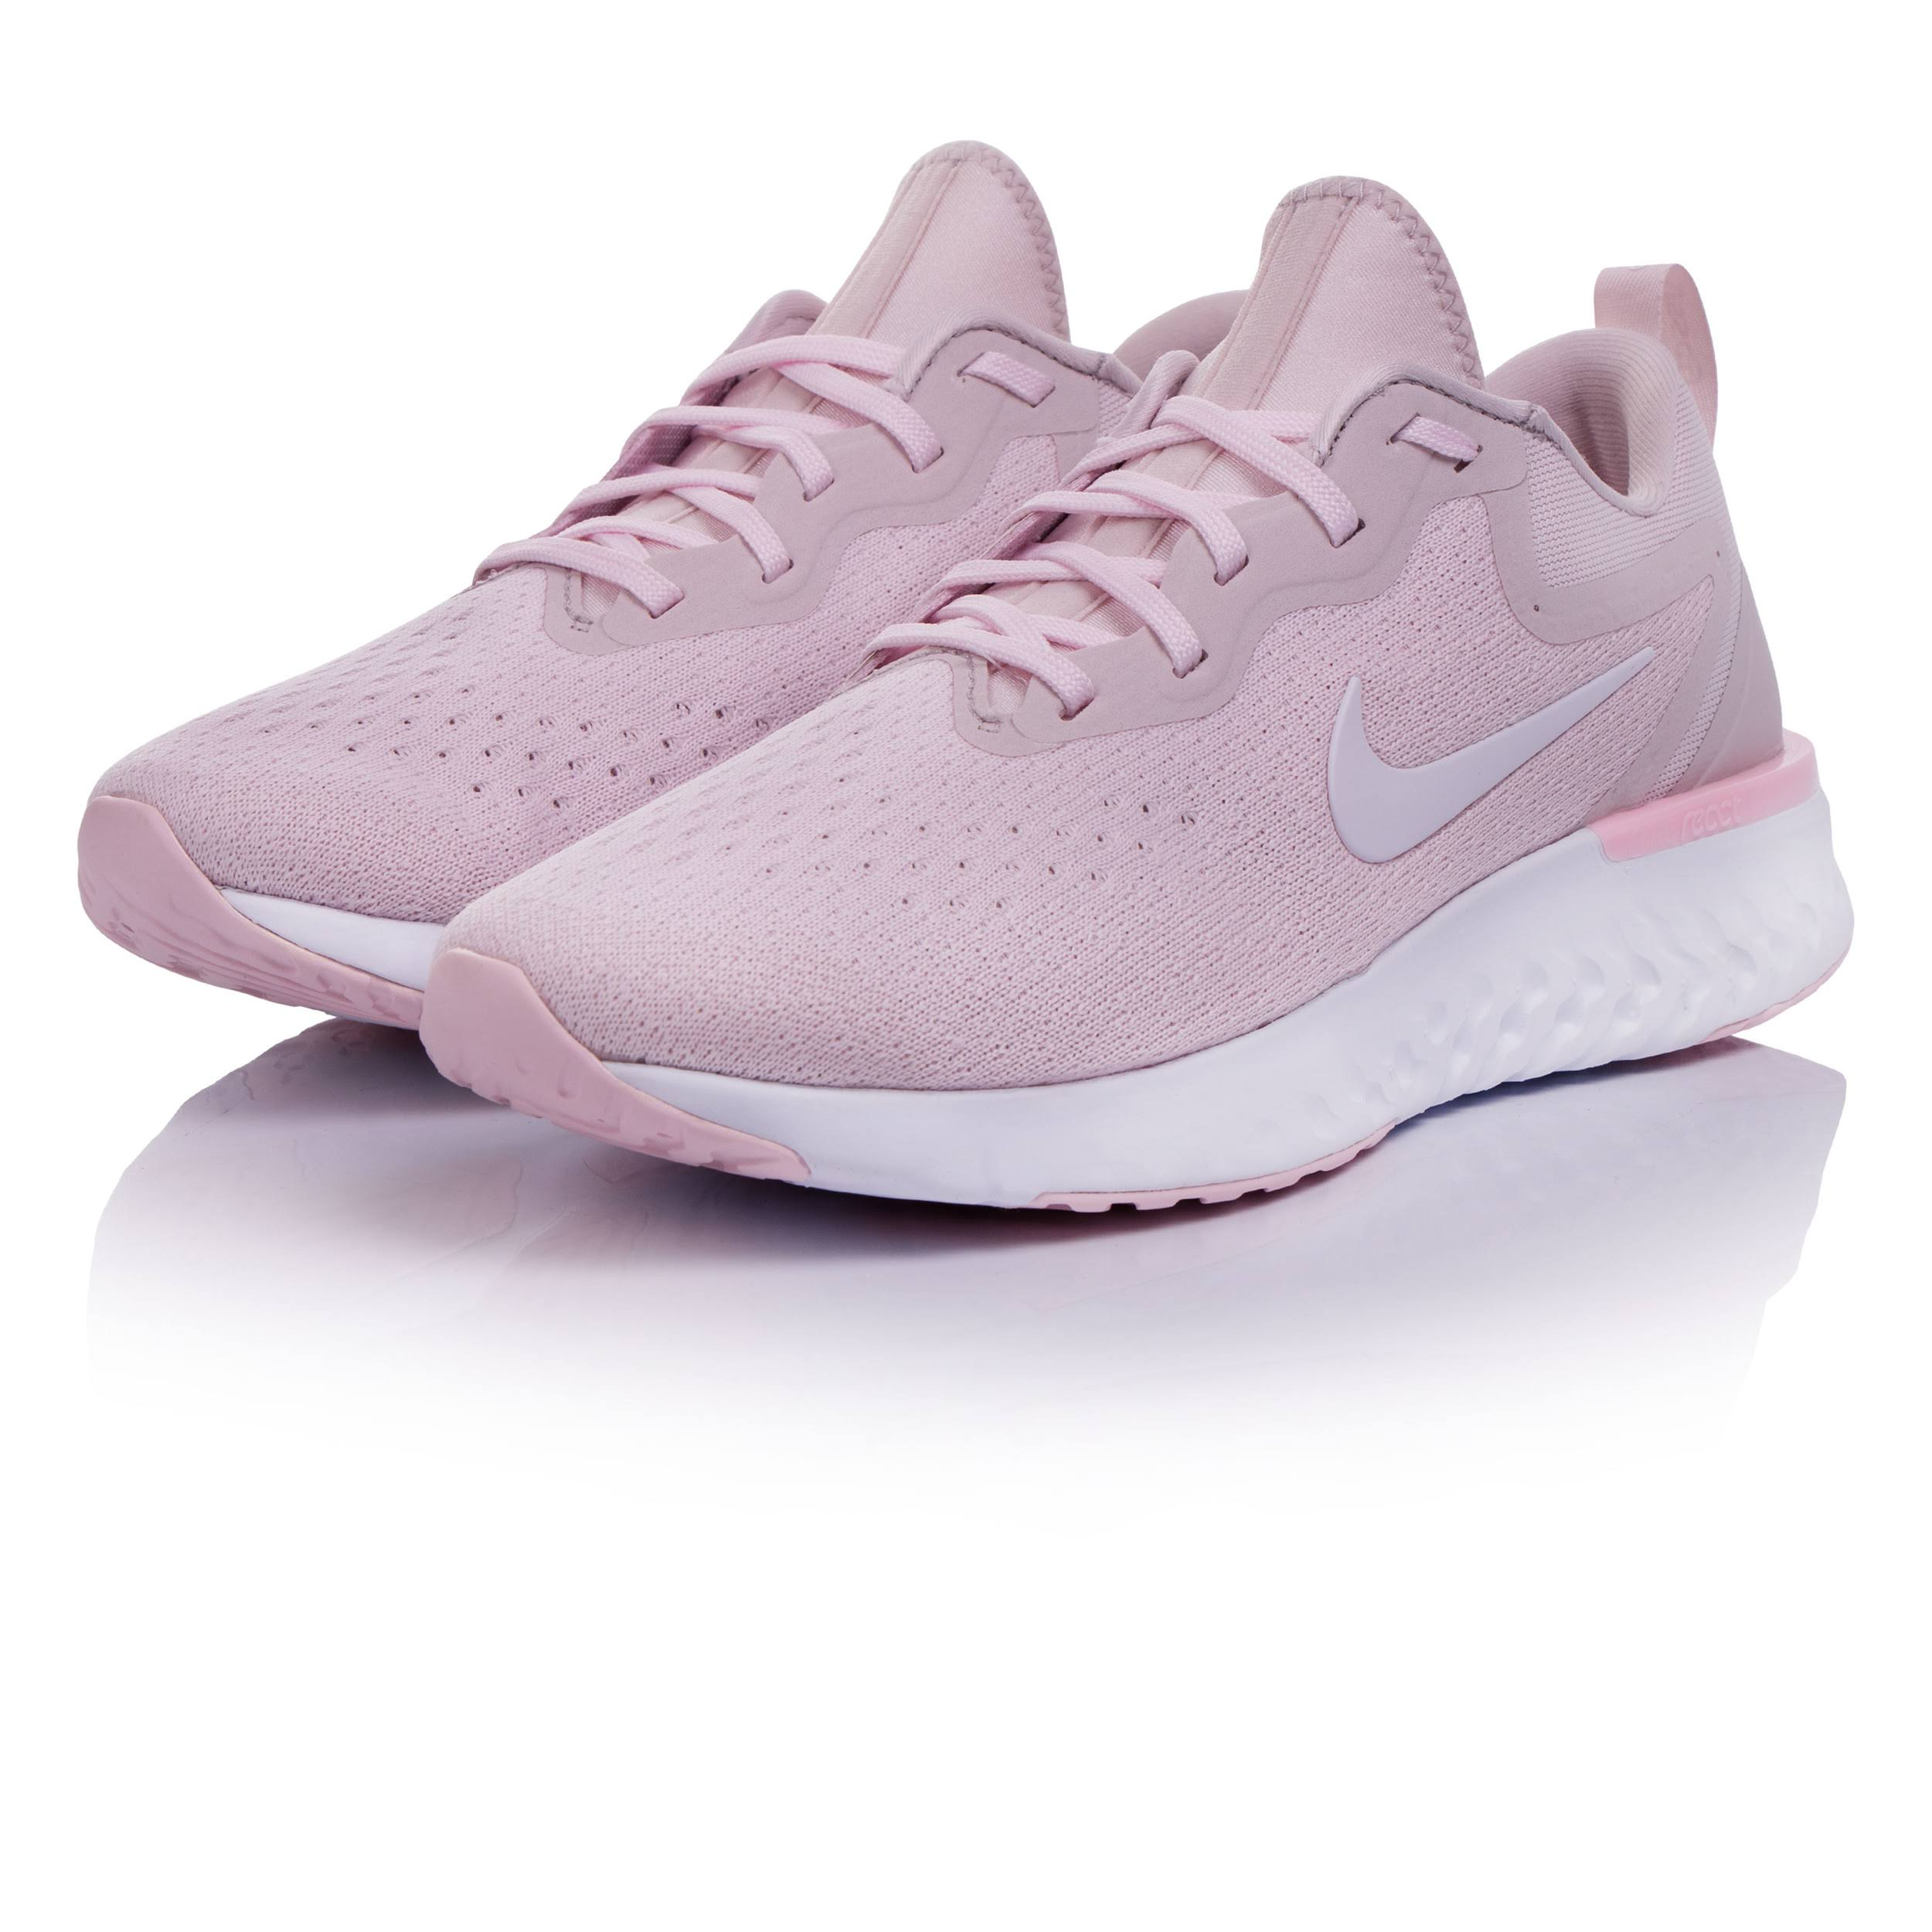 5 Schuhe Nike Ao9820600 React Wmns Odyssey 40 Pink Größe 0xgFCp